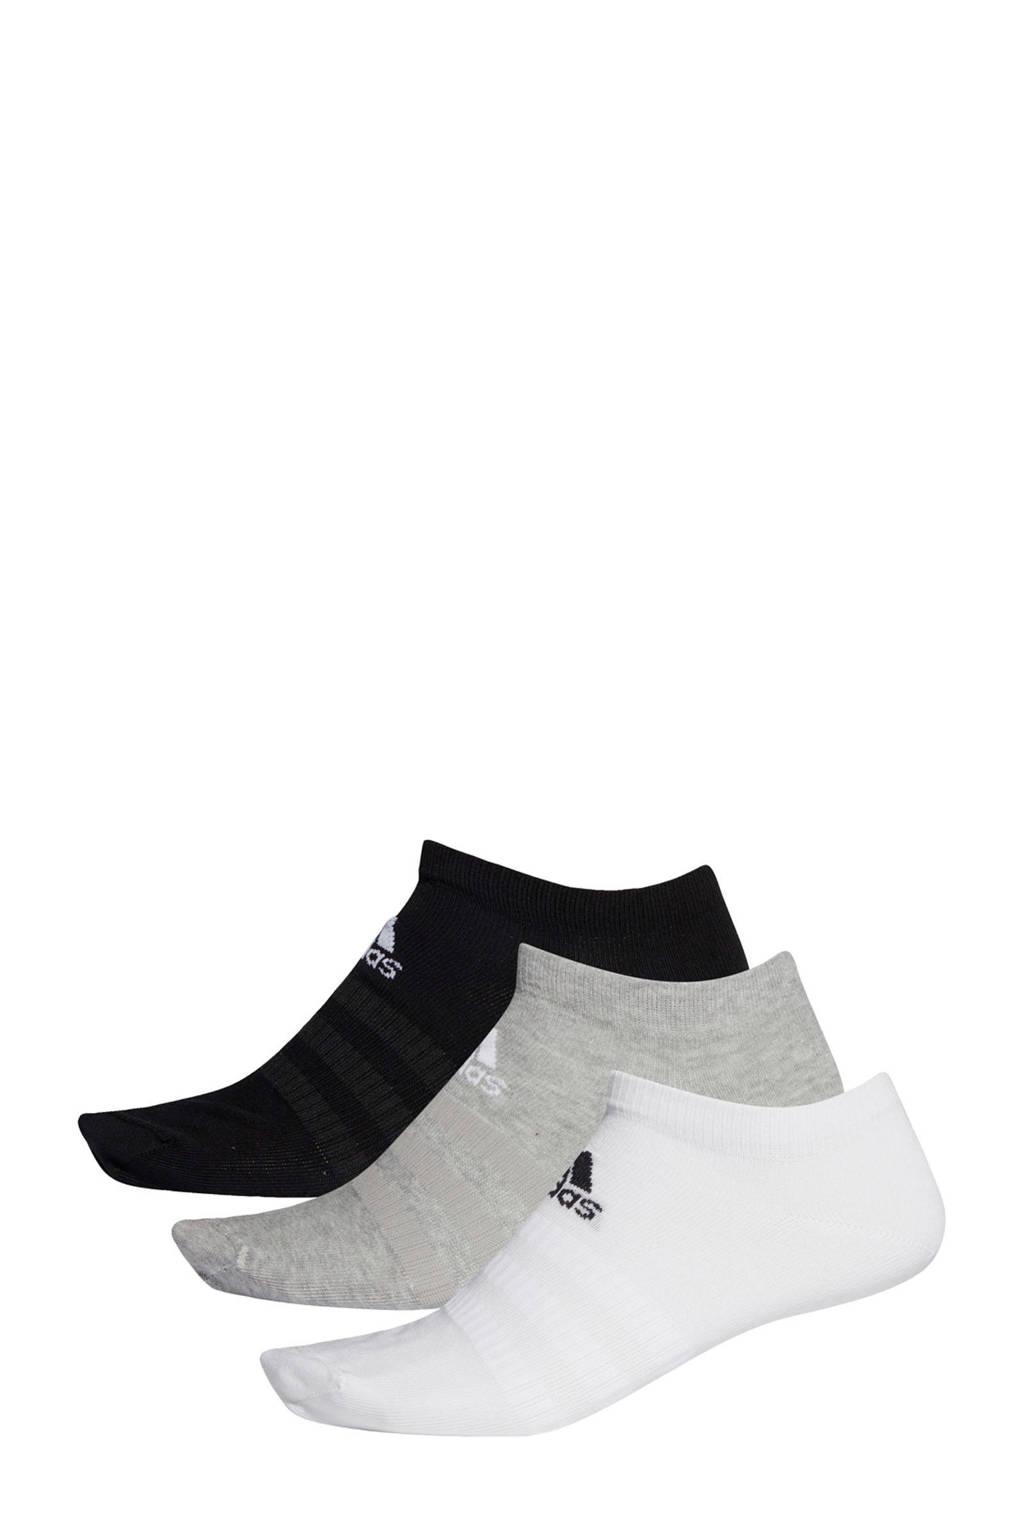 adidas Performance   sportsokken  - set van 3 zwart/grijs/wit, Zwart/grijs/wit